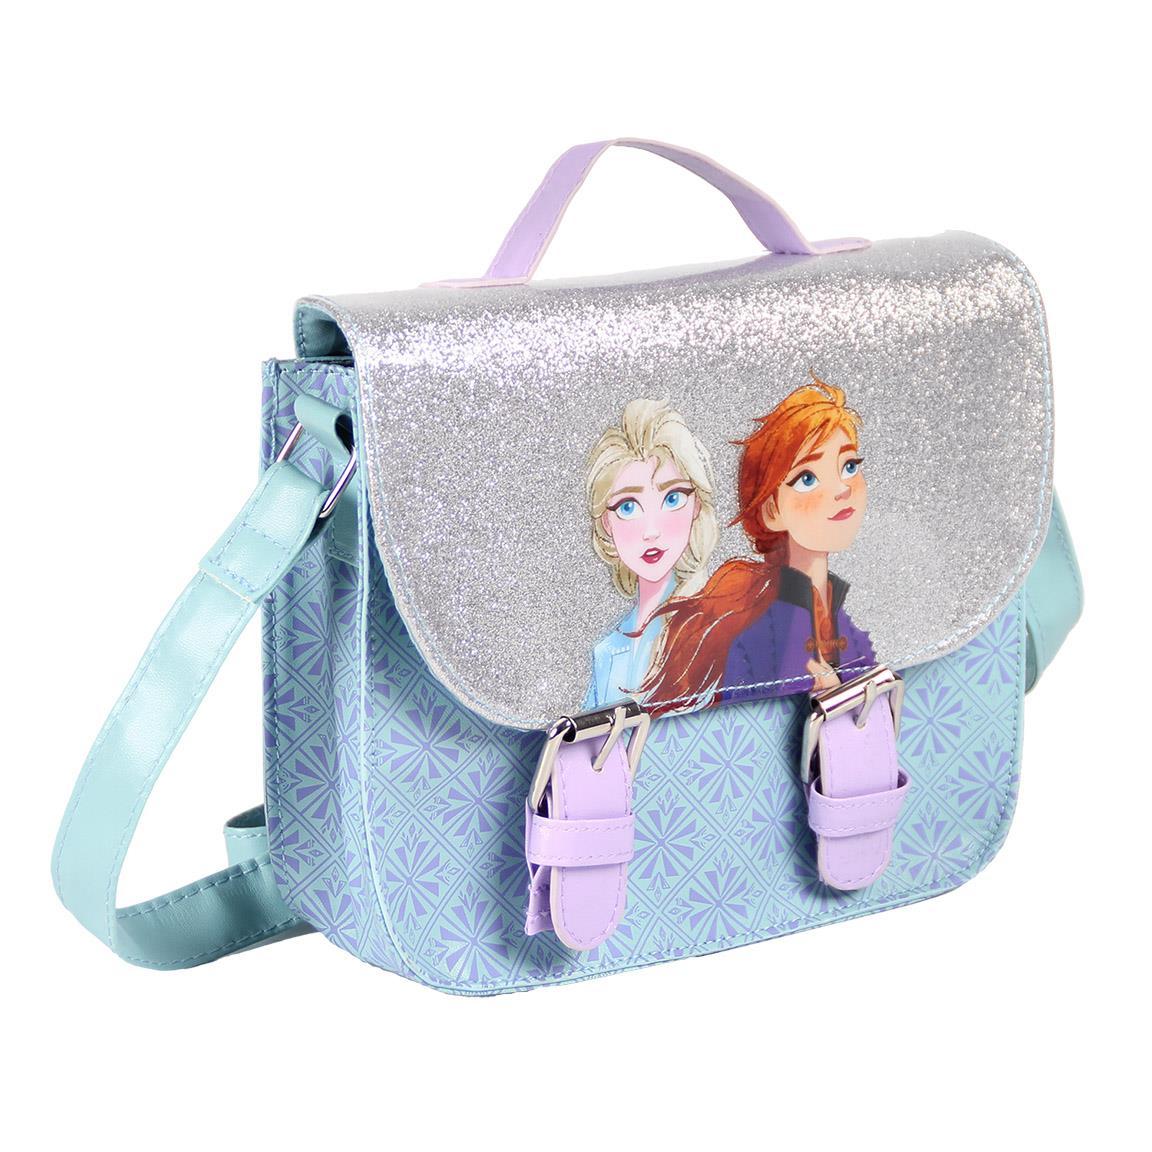 CRD - Maletín escolar Frozen II purpurina